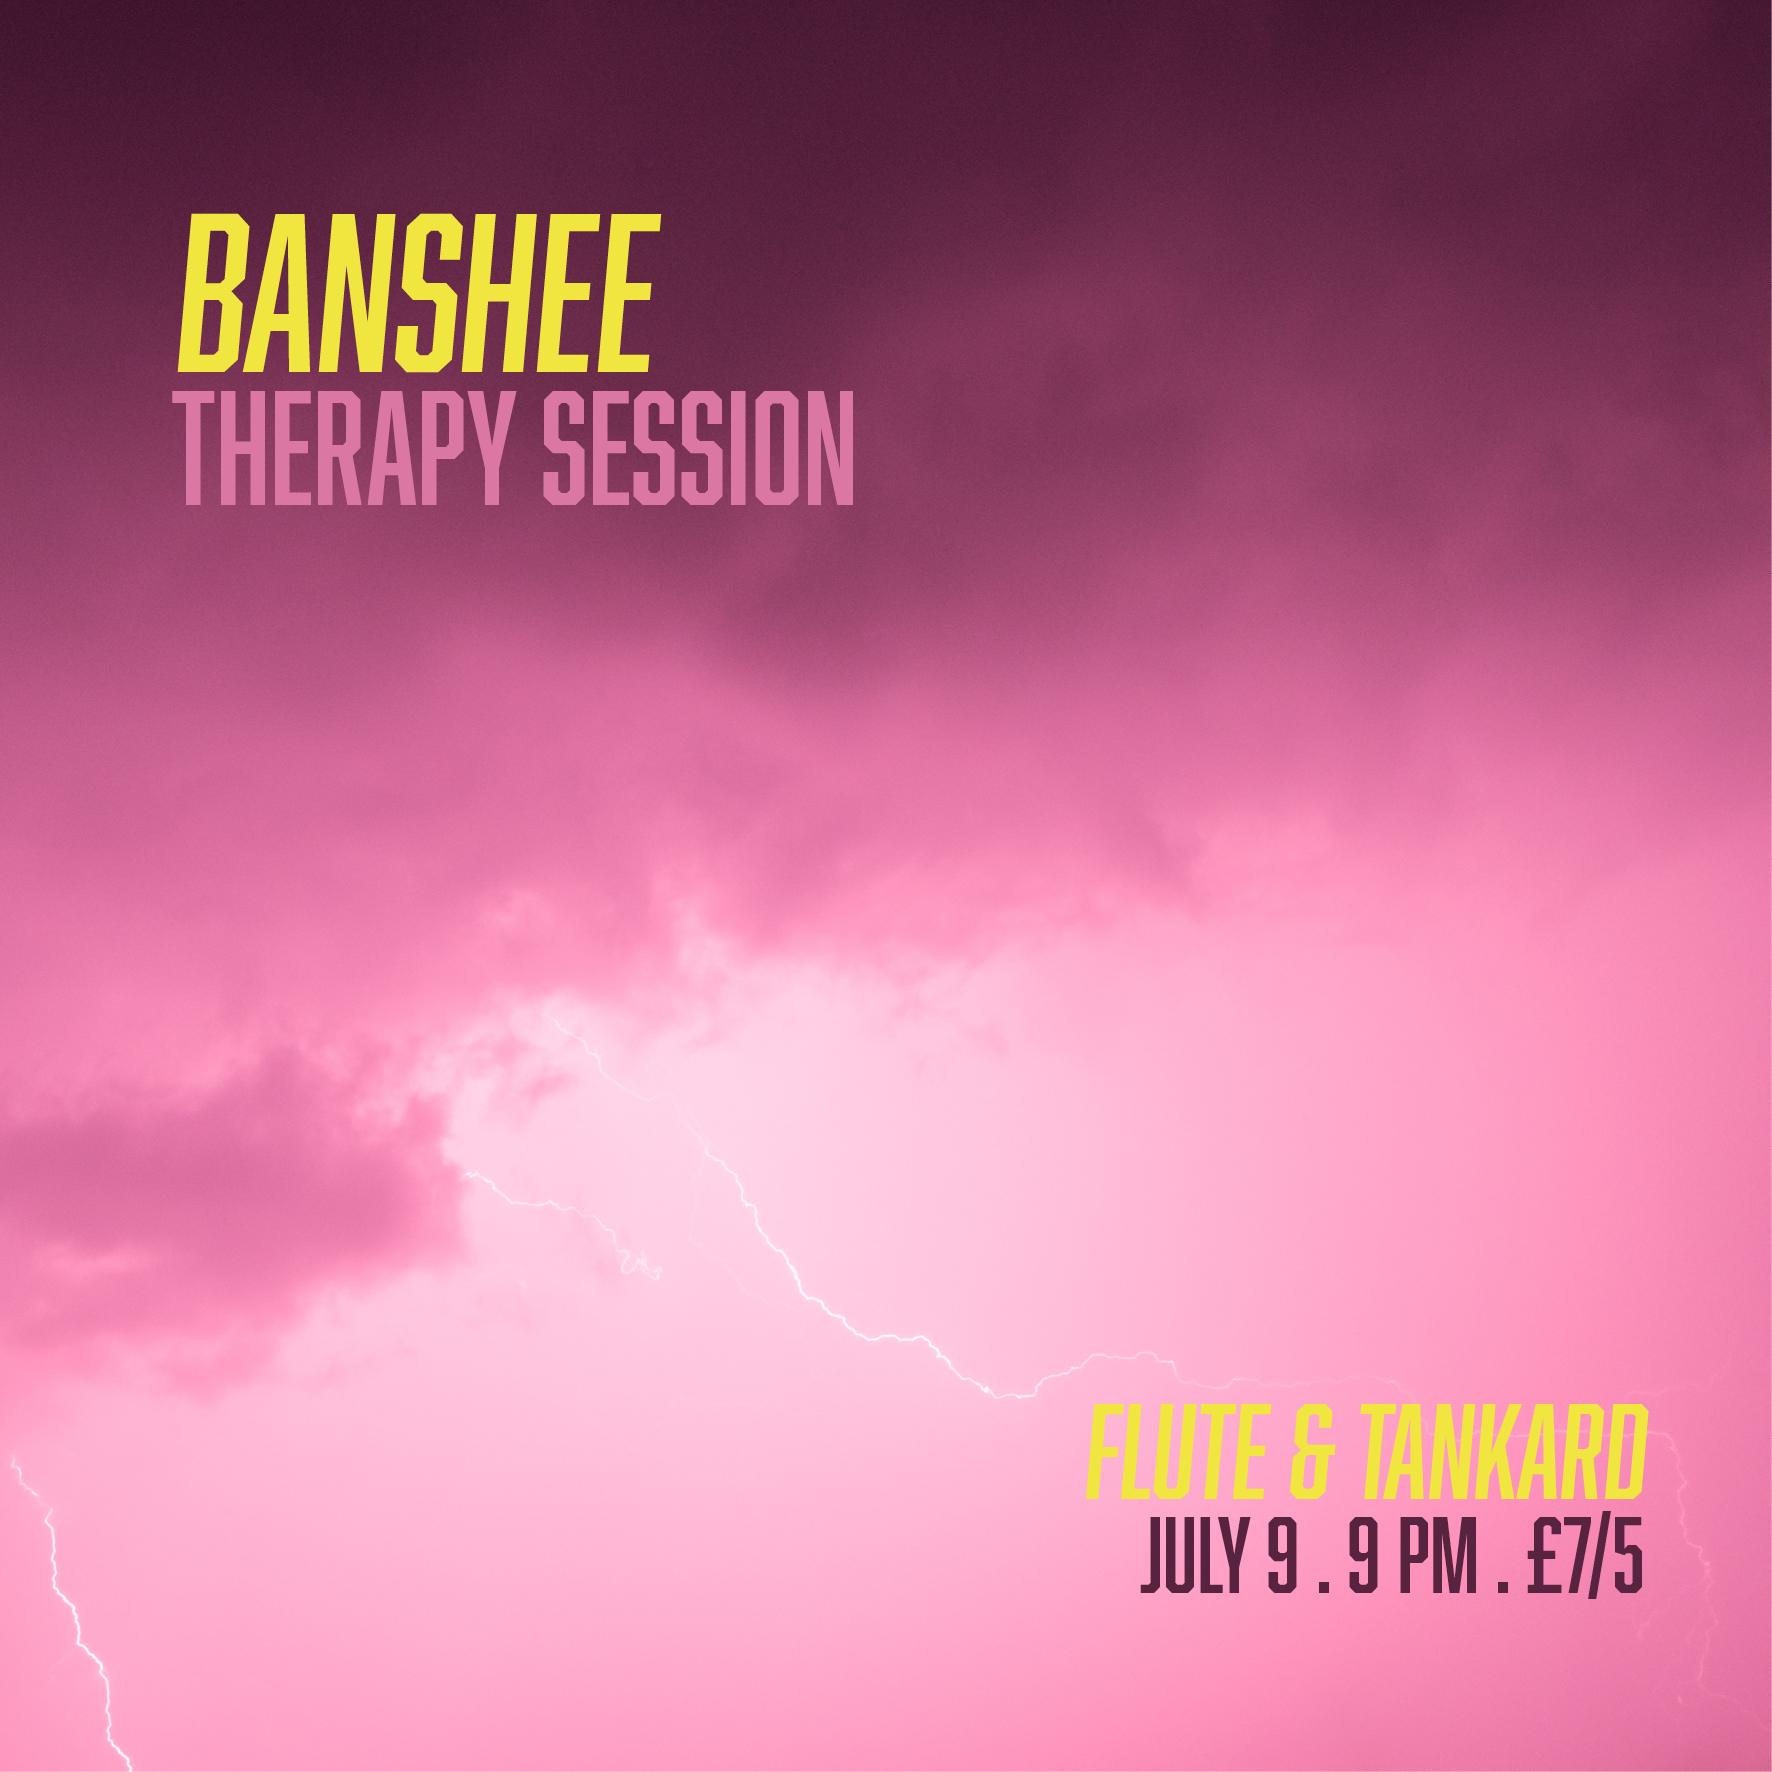 banshee lightning.jpg